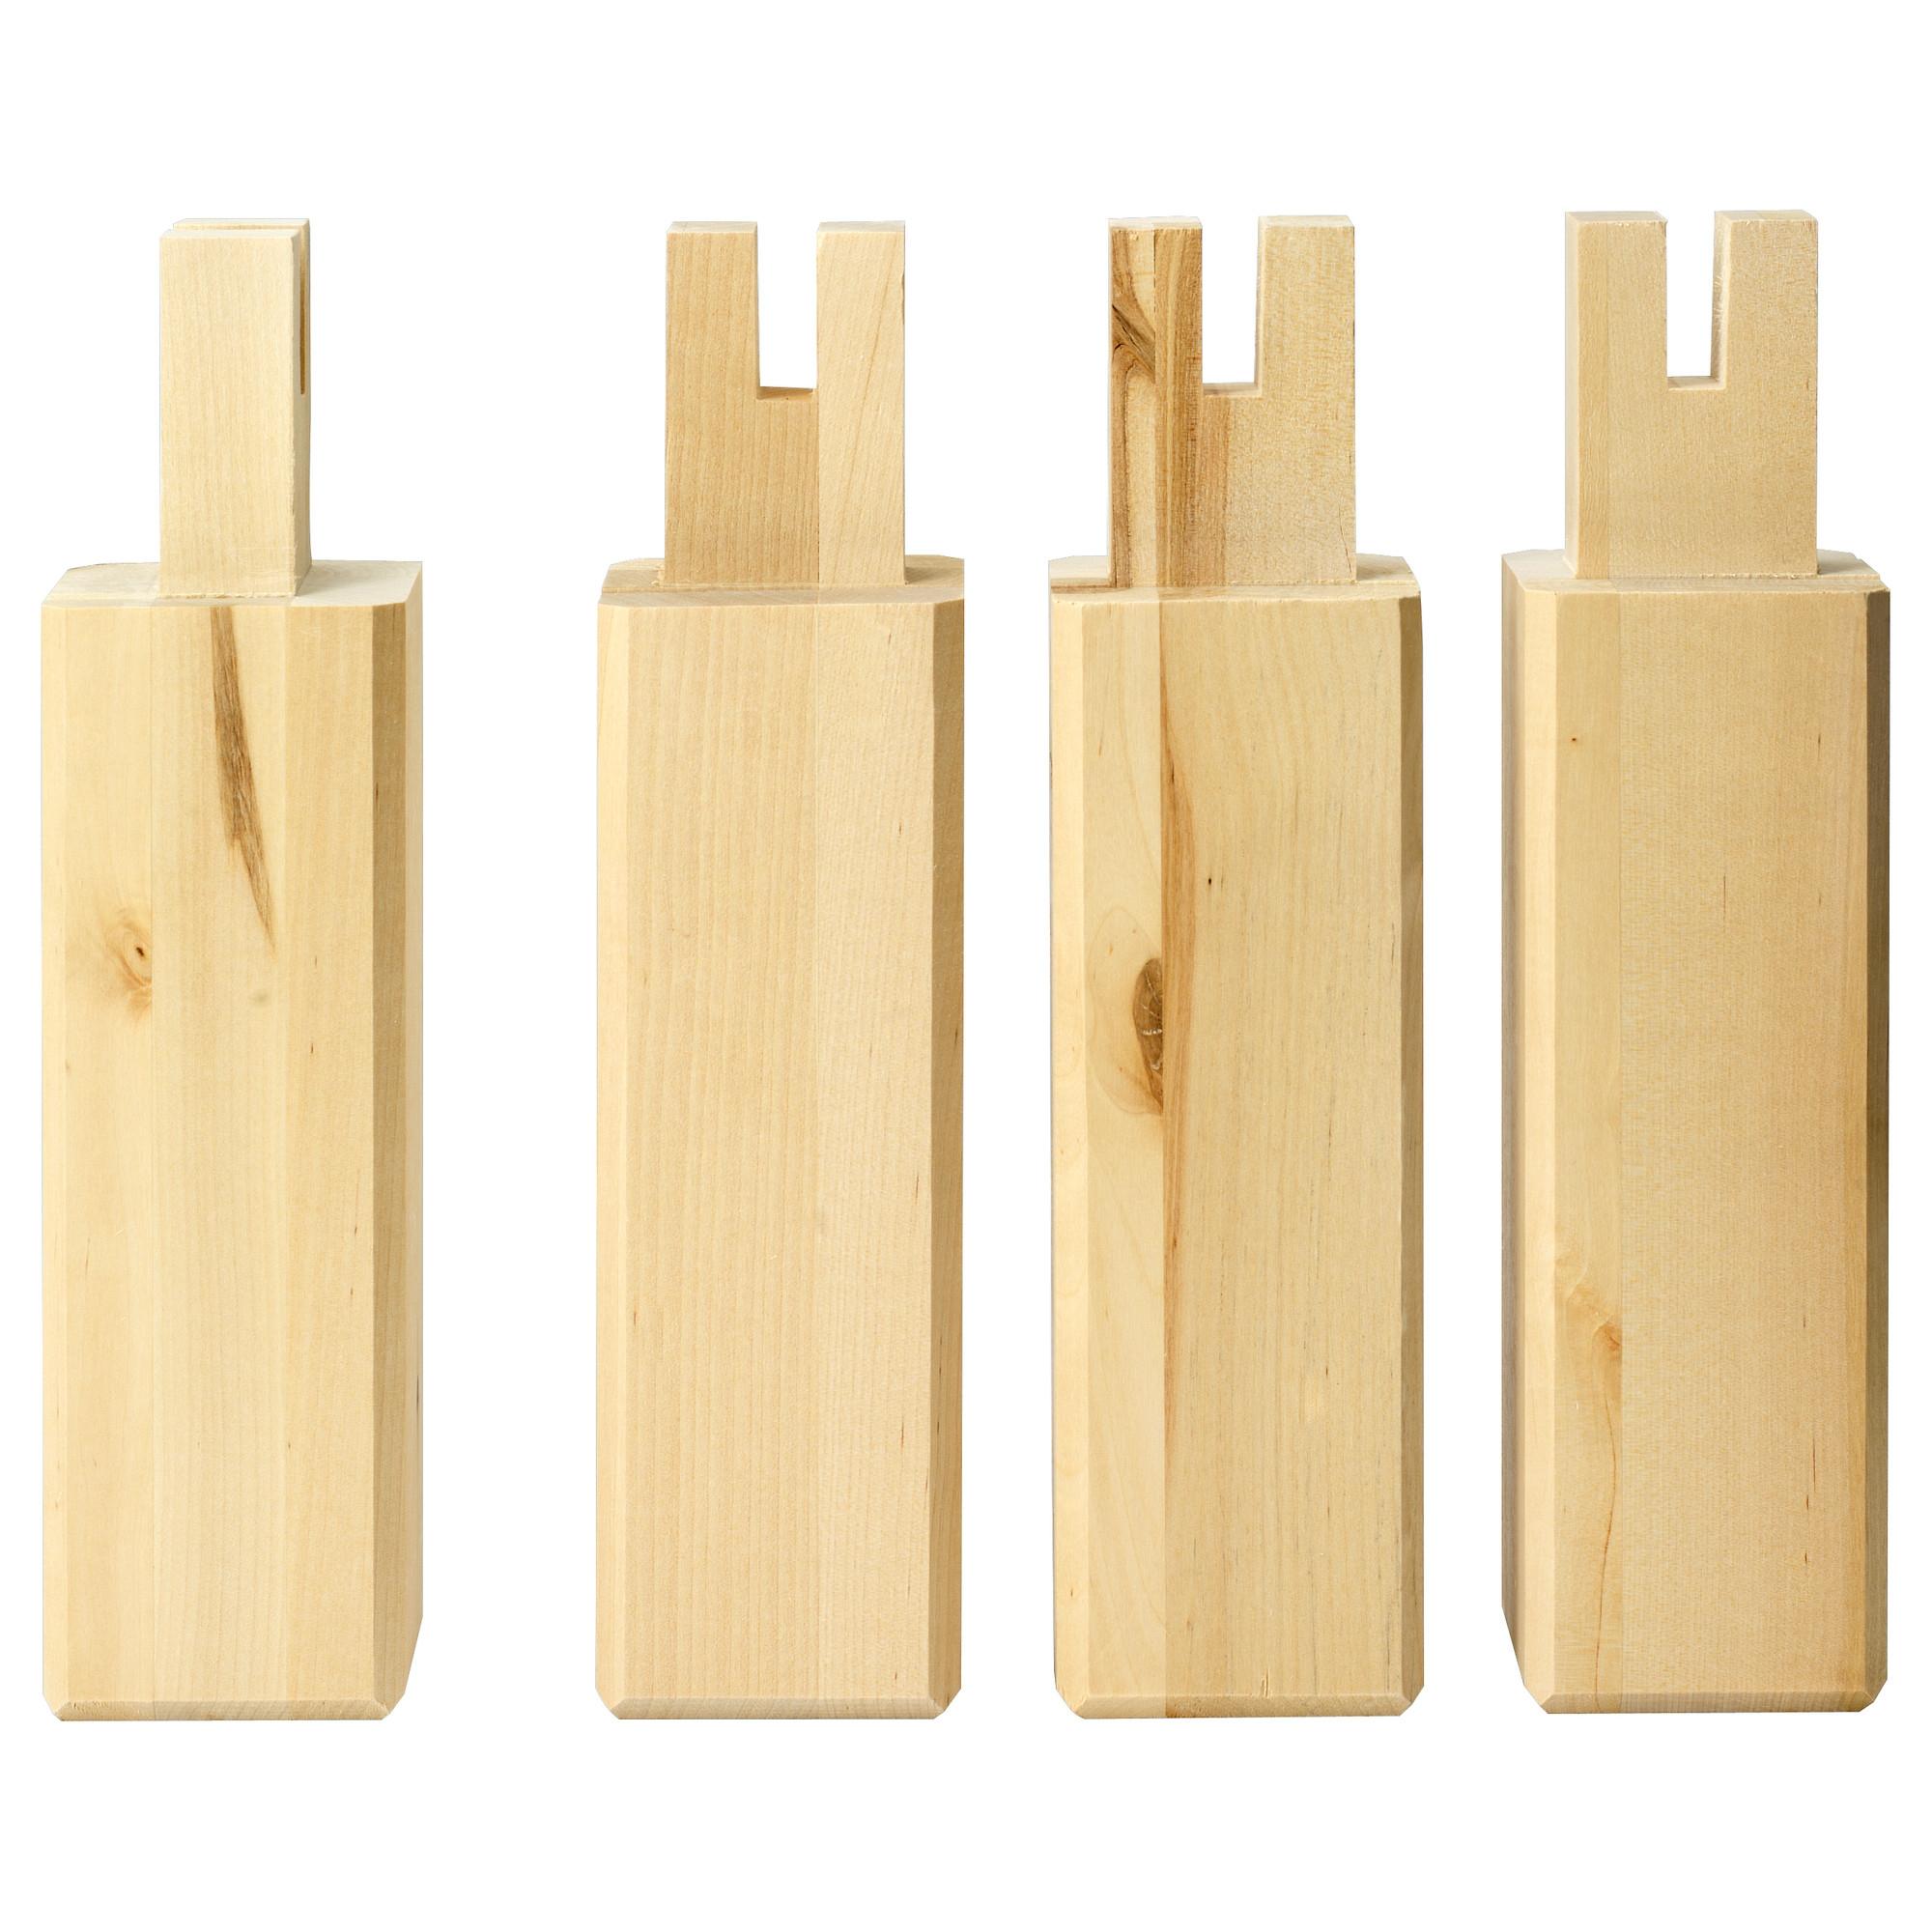 Ikea mallorca detalles producto for Colchones ikea 180x200